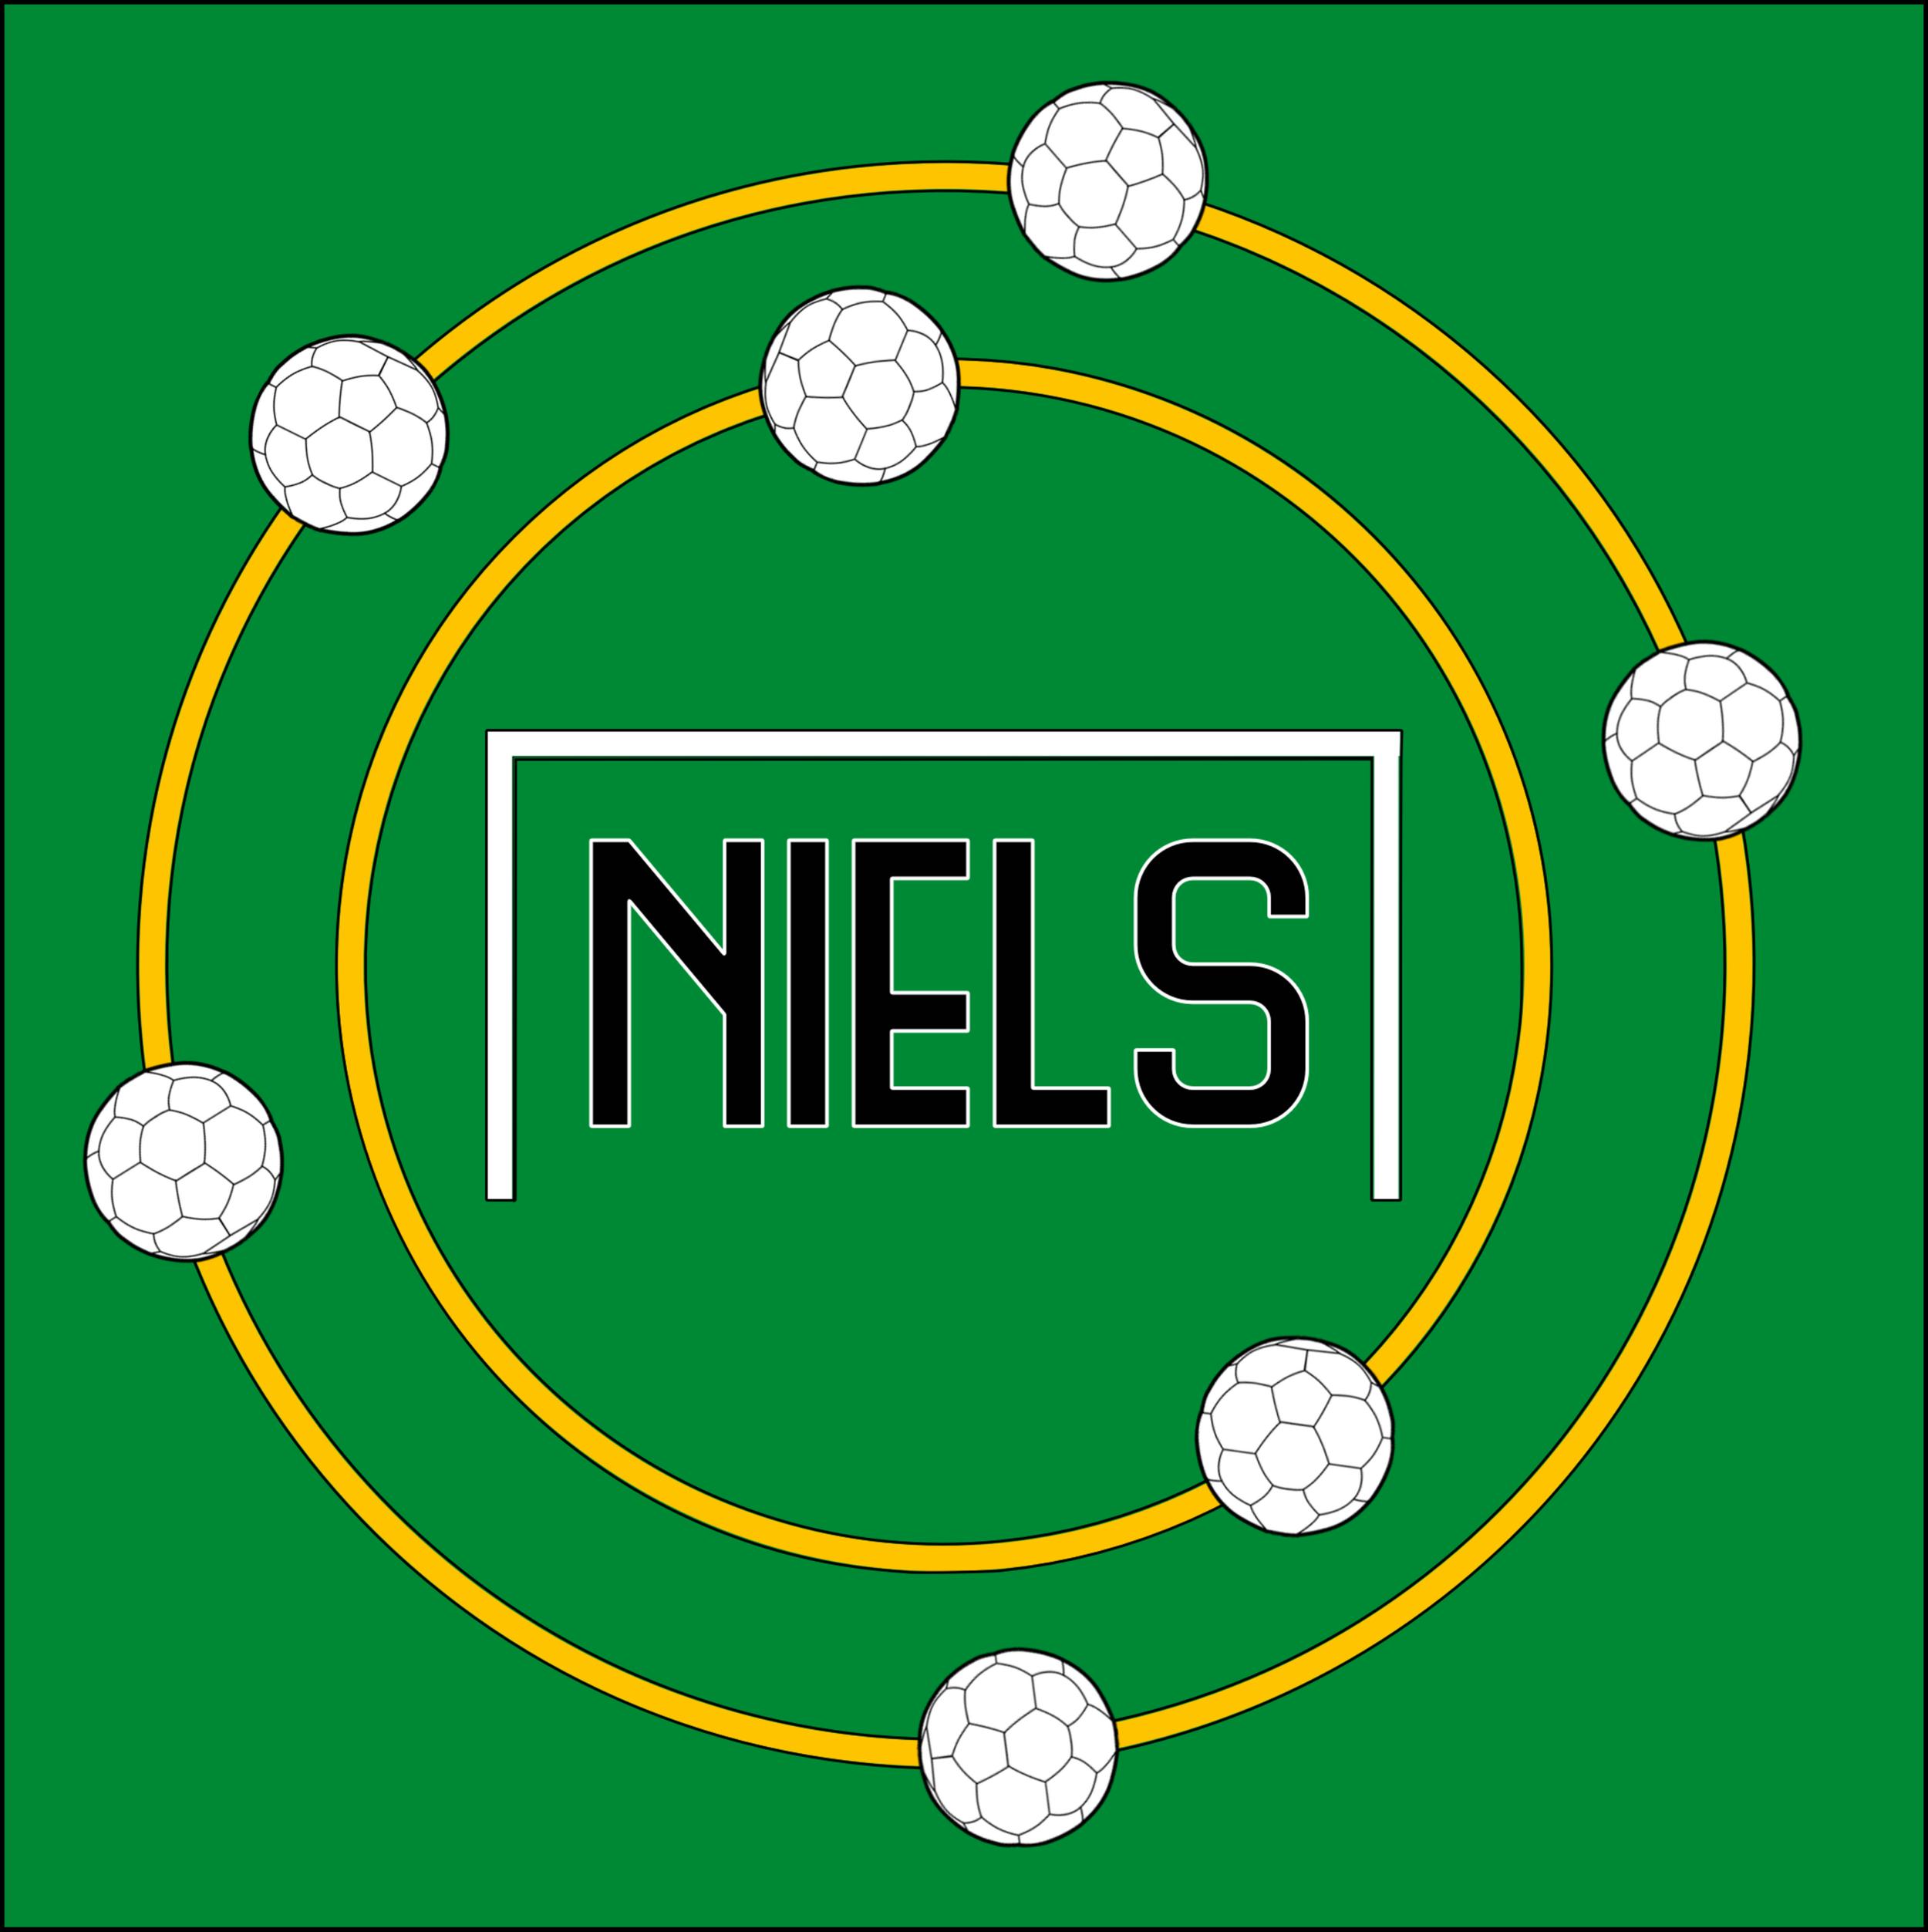 Niels.GreenandYellow.png